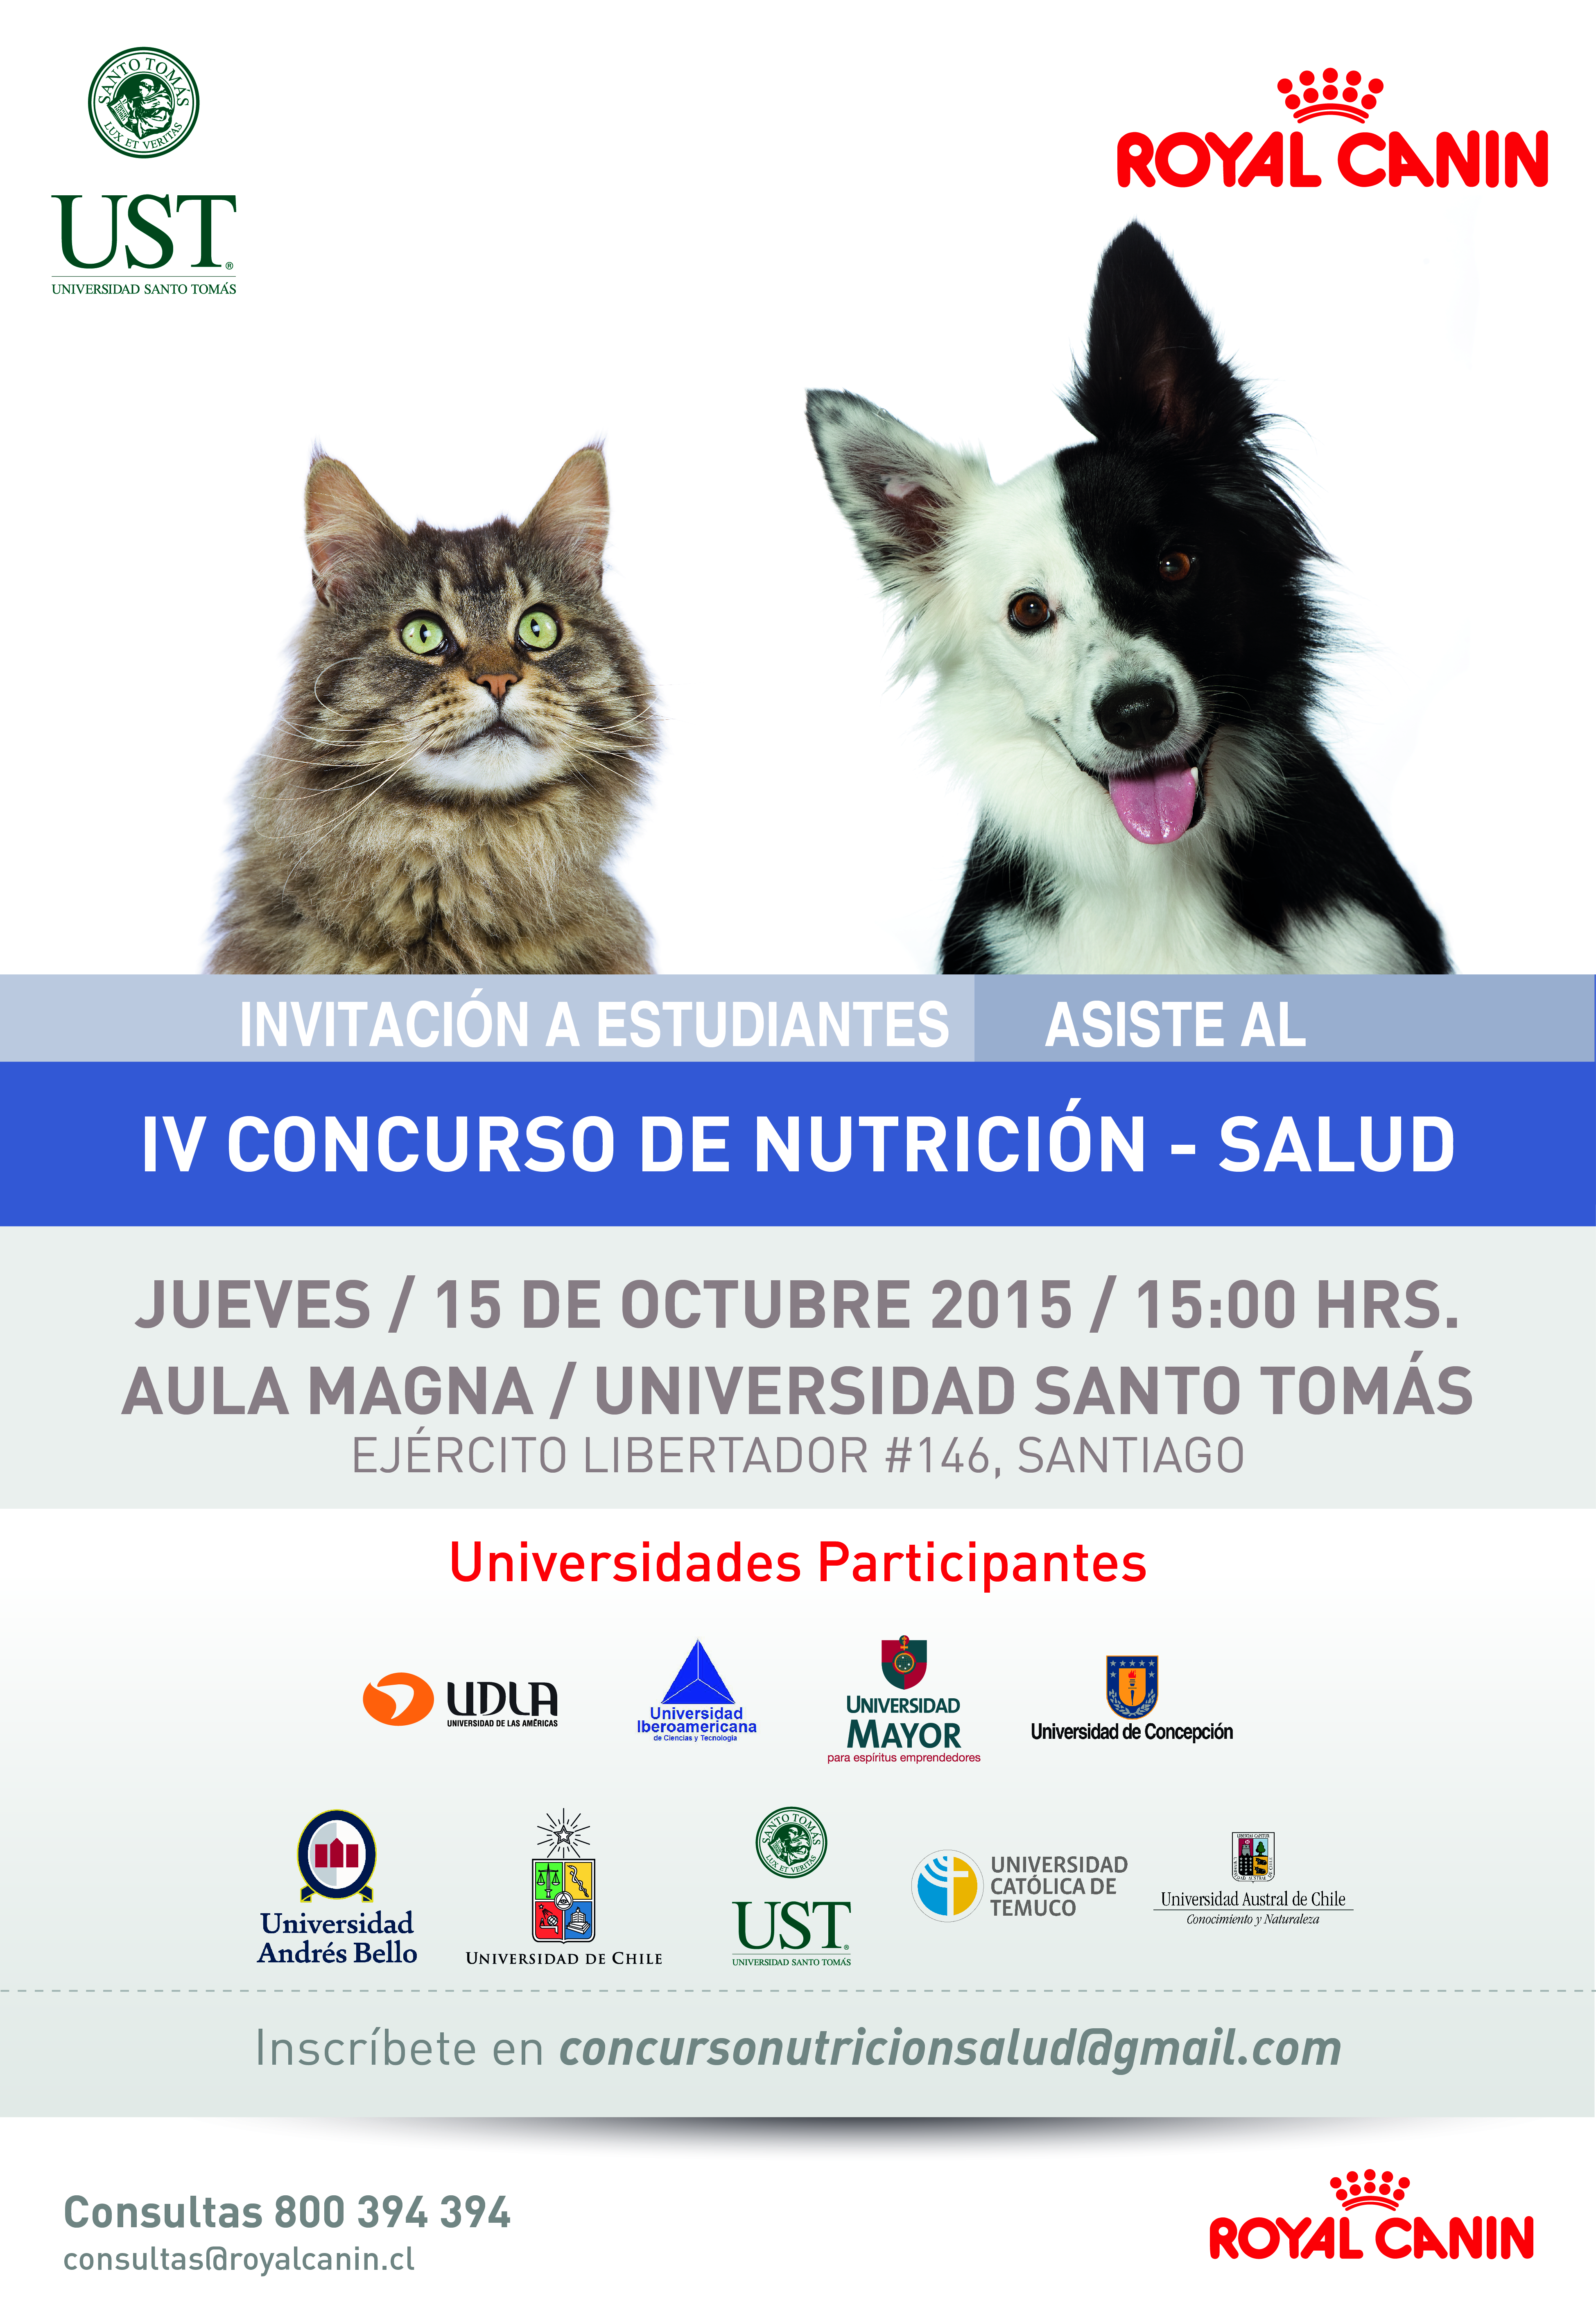 CONCURSO ESTUDIANTIL ROYAL CANIN 2015